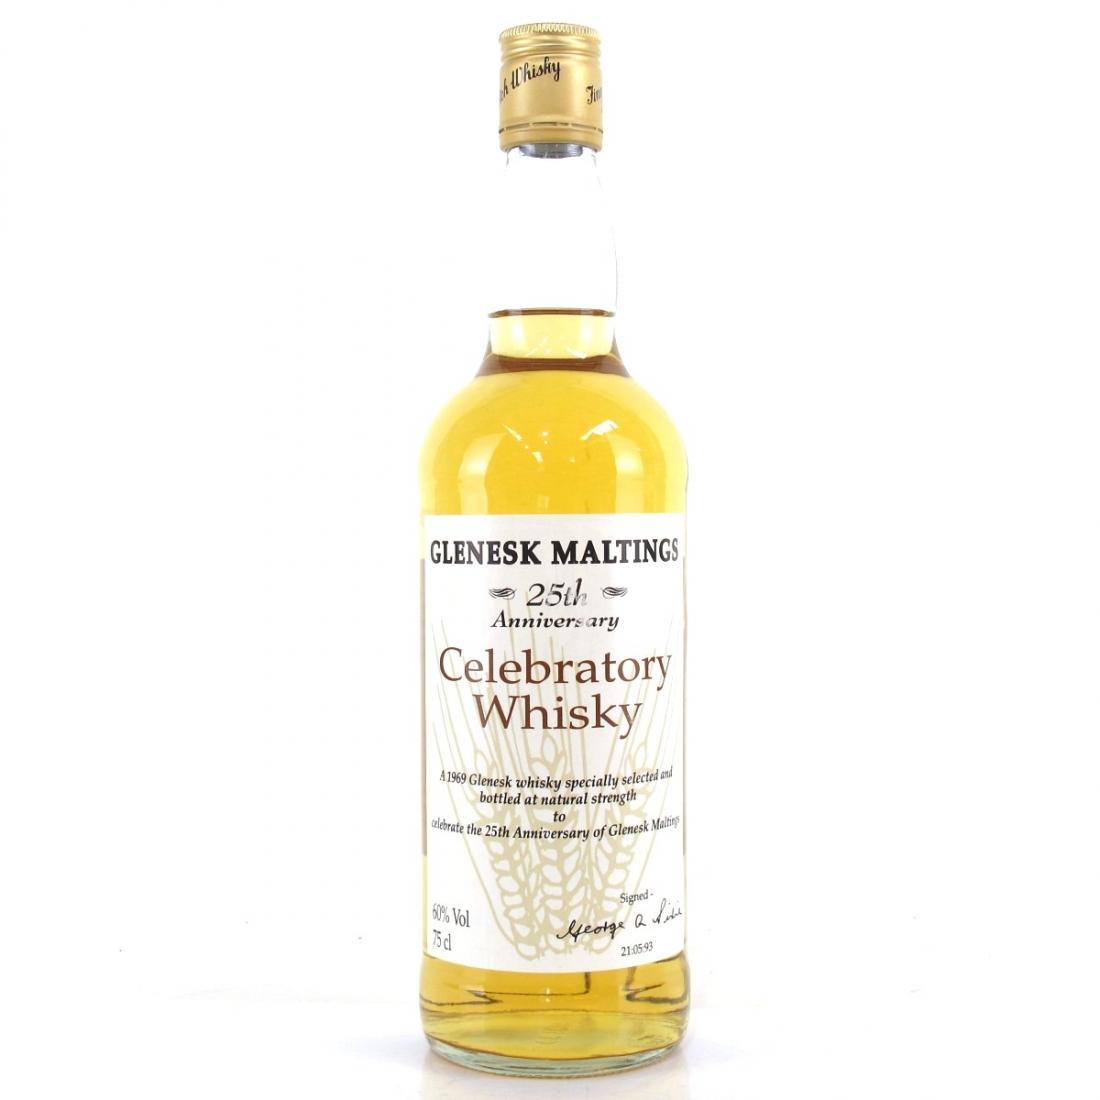 Glenesk 1969 Maltings 25th Anniversary 75cl